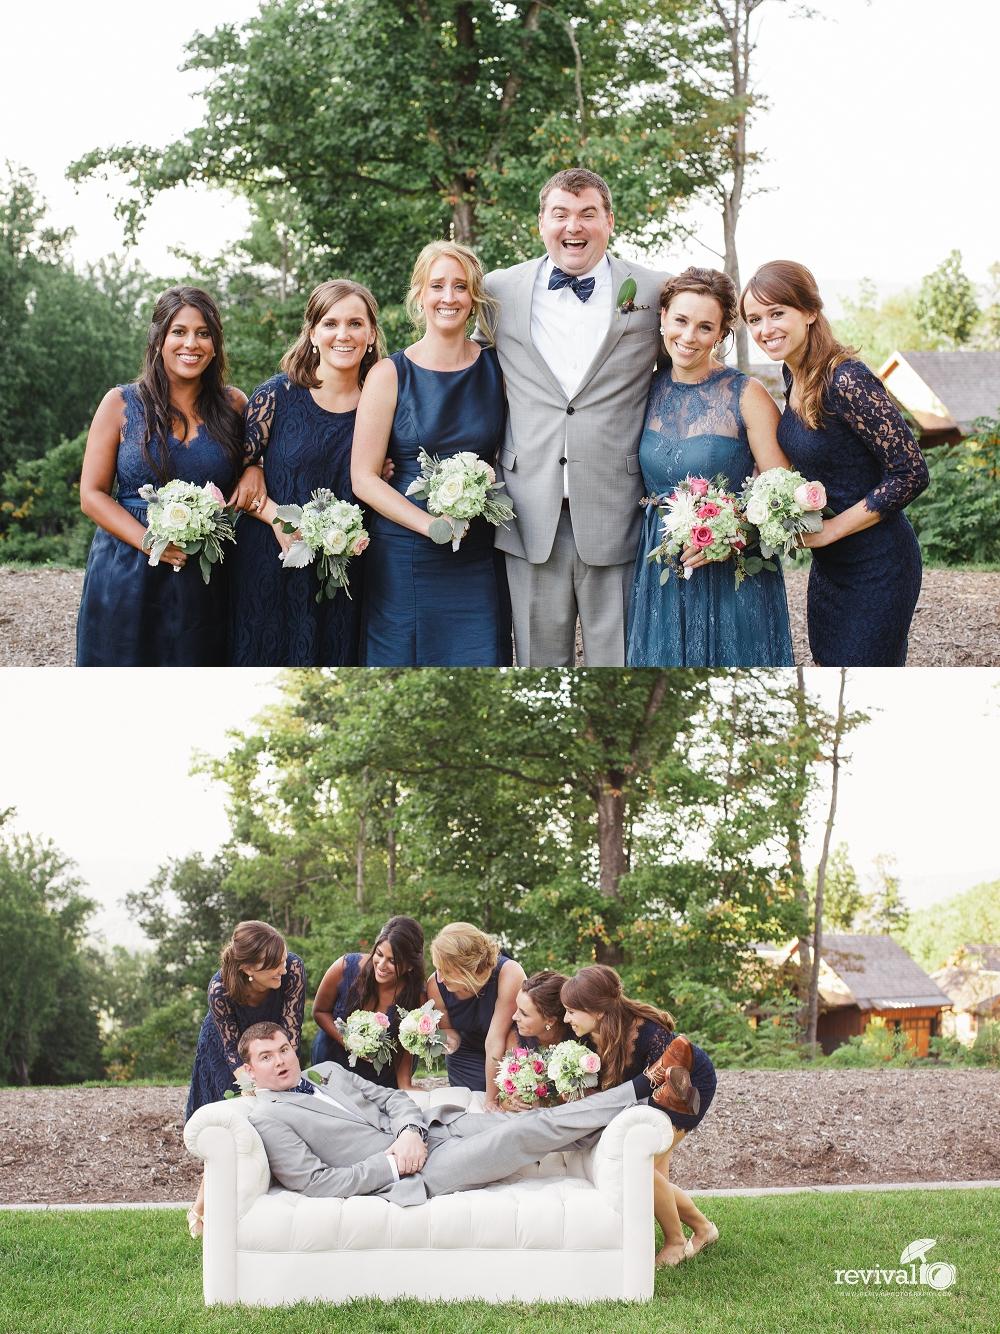 Photos by Revival Photography Blue Ridge Mountain Club Weddings Blowing Rock, NC Mountain Weddings Wedding Photographers www.revivalphotography.com